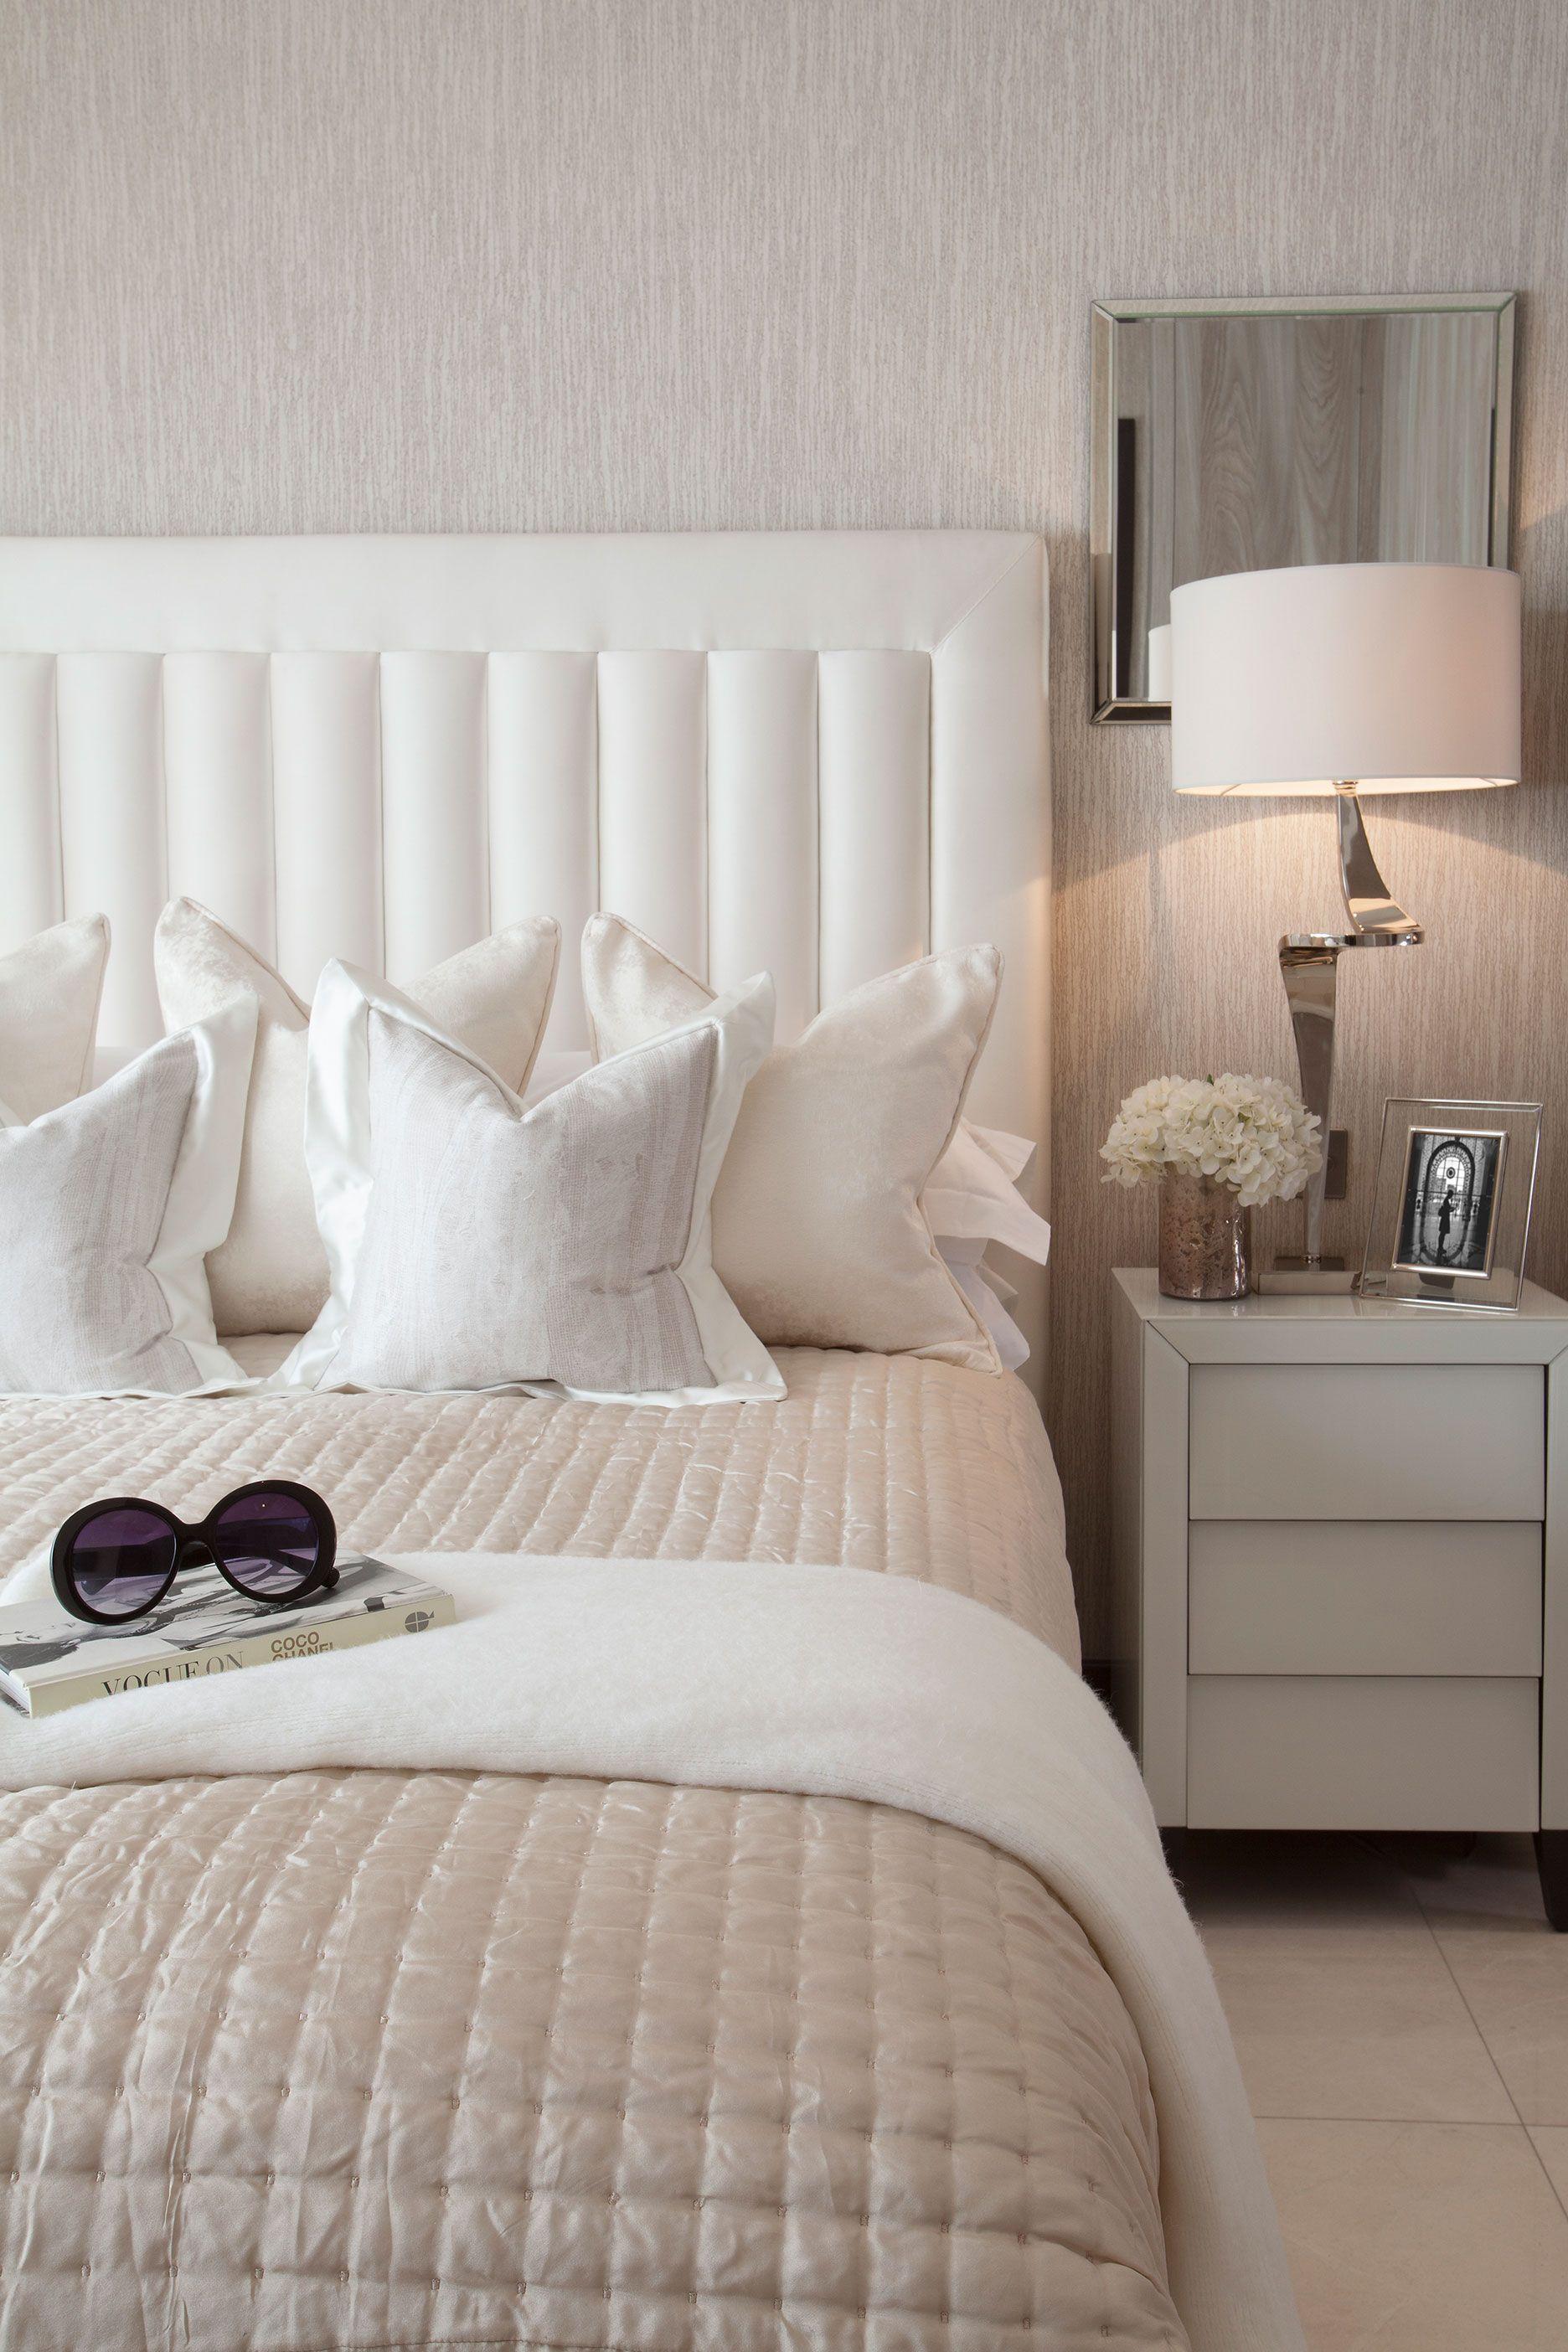 Master Bedroom Bed Cushions Headboard Bespoke Light Bedside